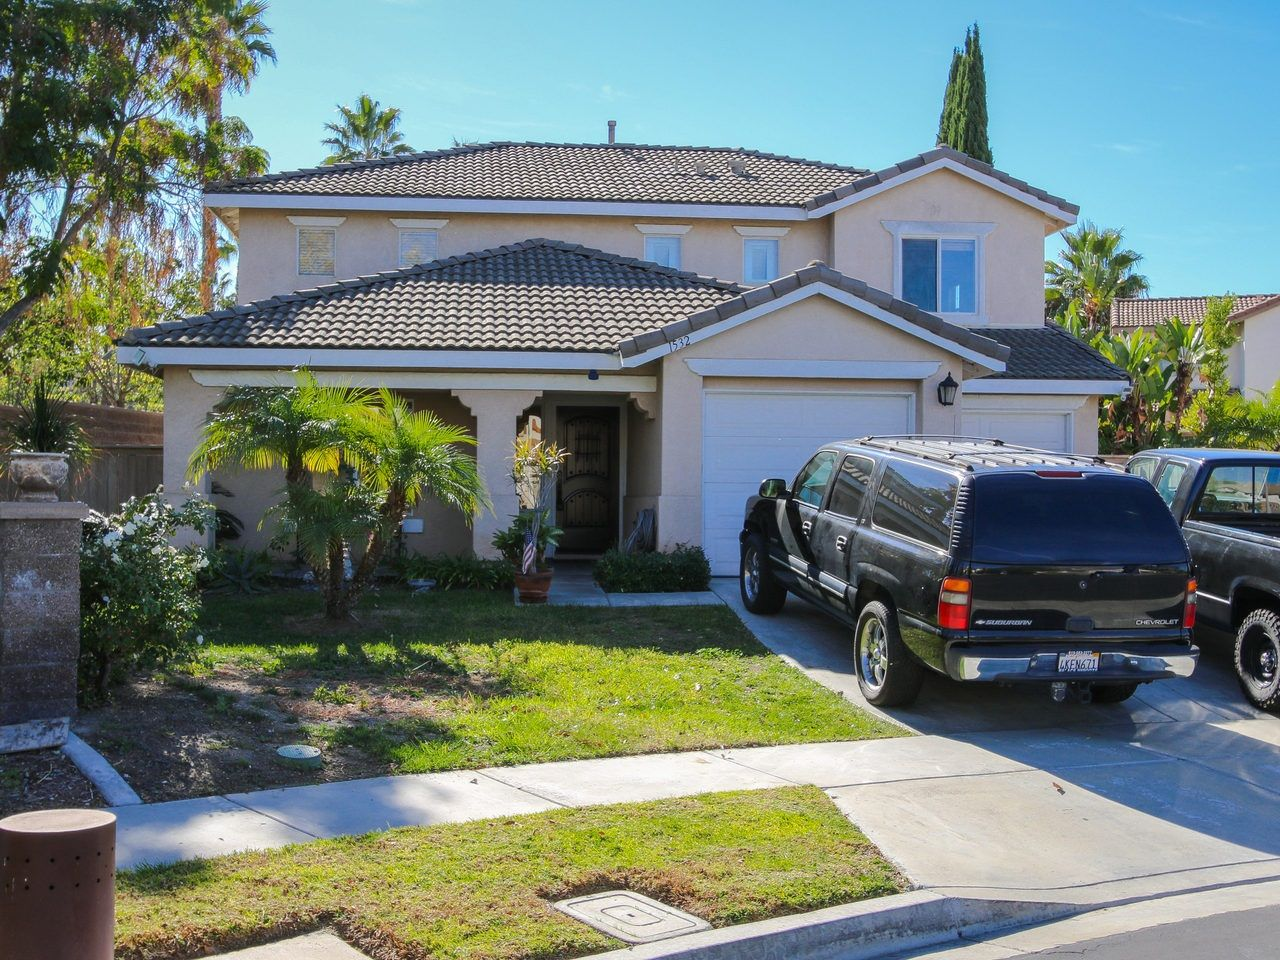 Main Photo: Detached for sale: 1532 Cordelia Street in Chula Vista